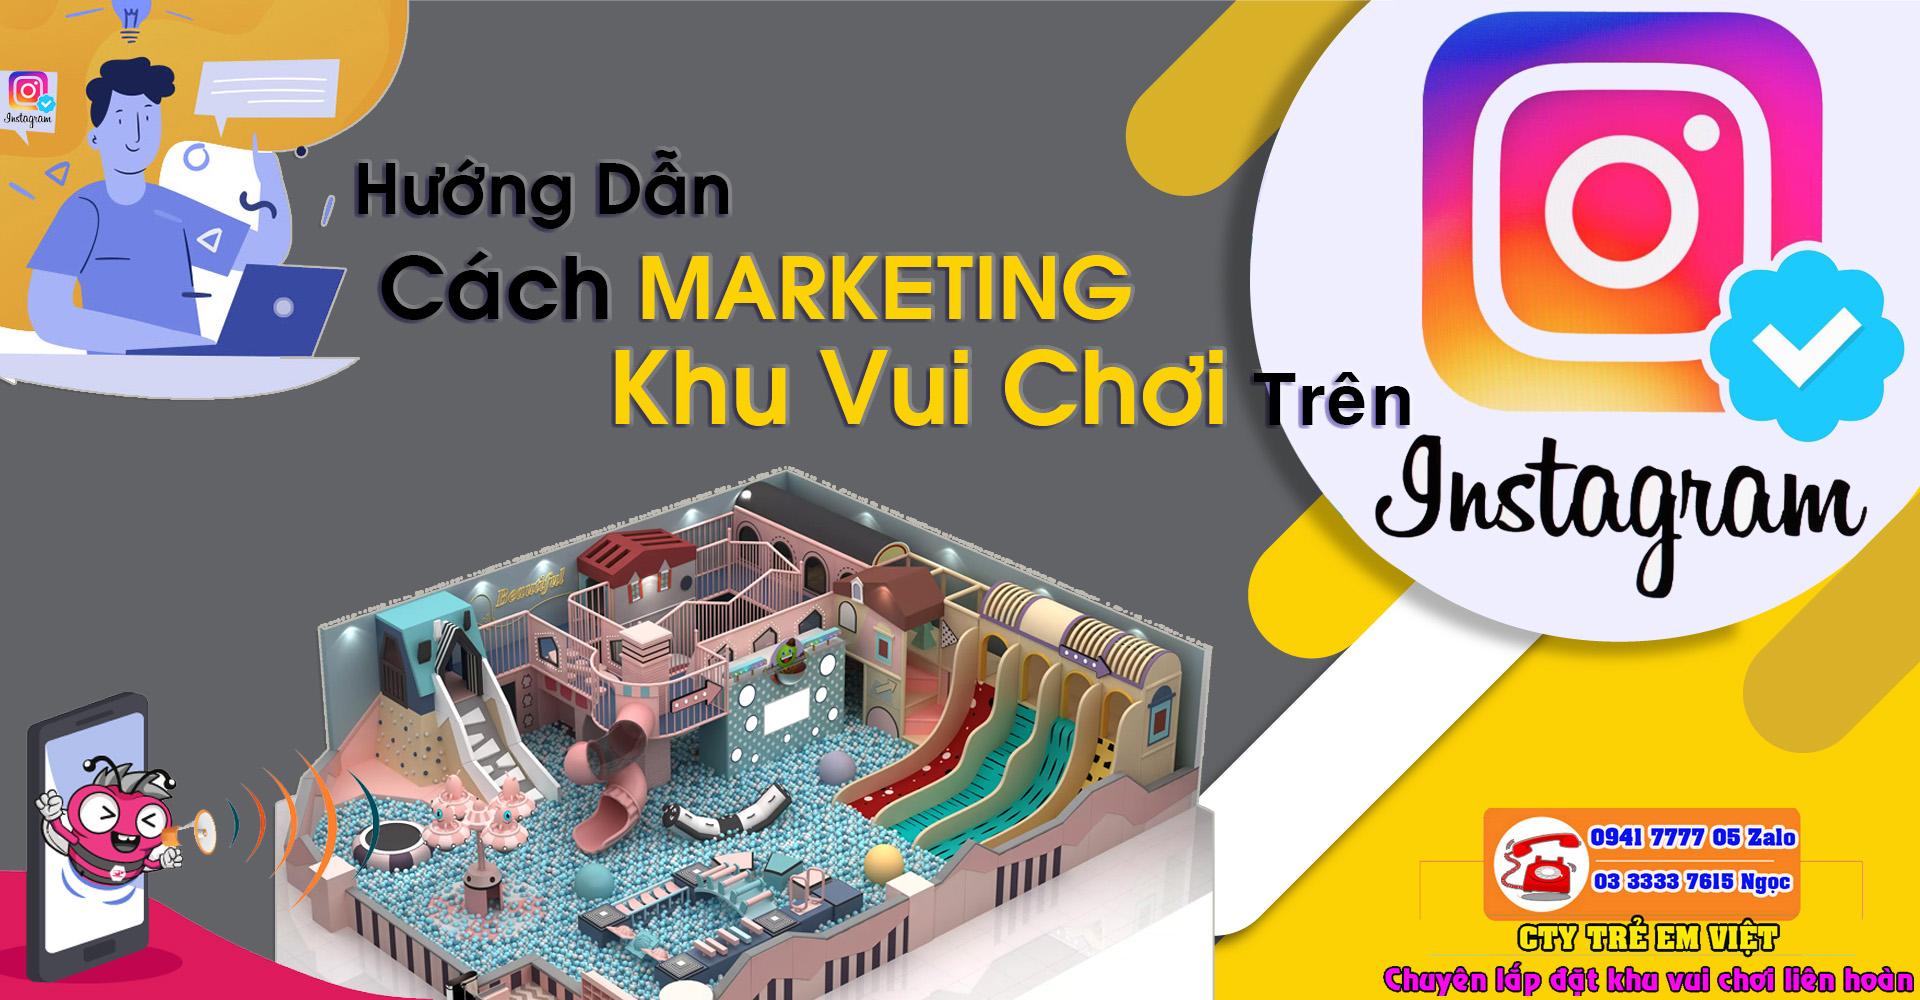 Marketing khu vui chơi